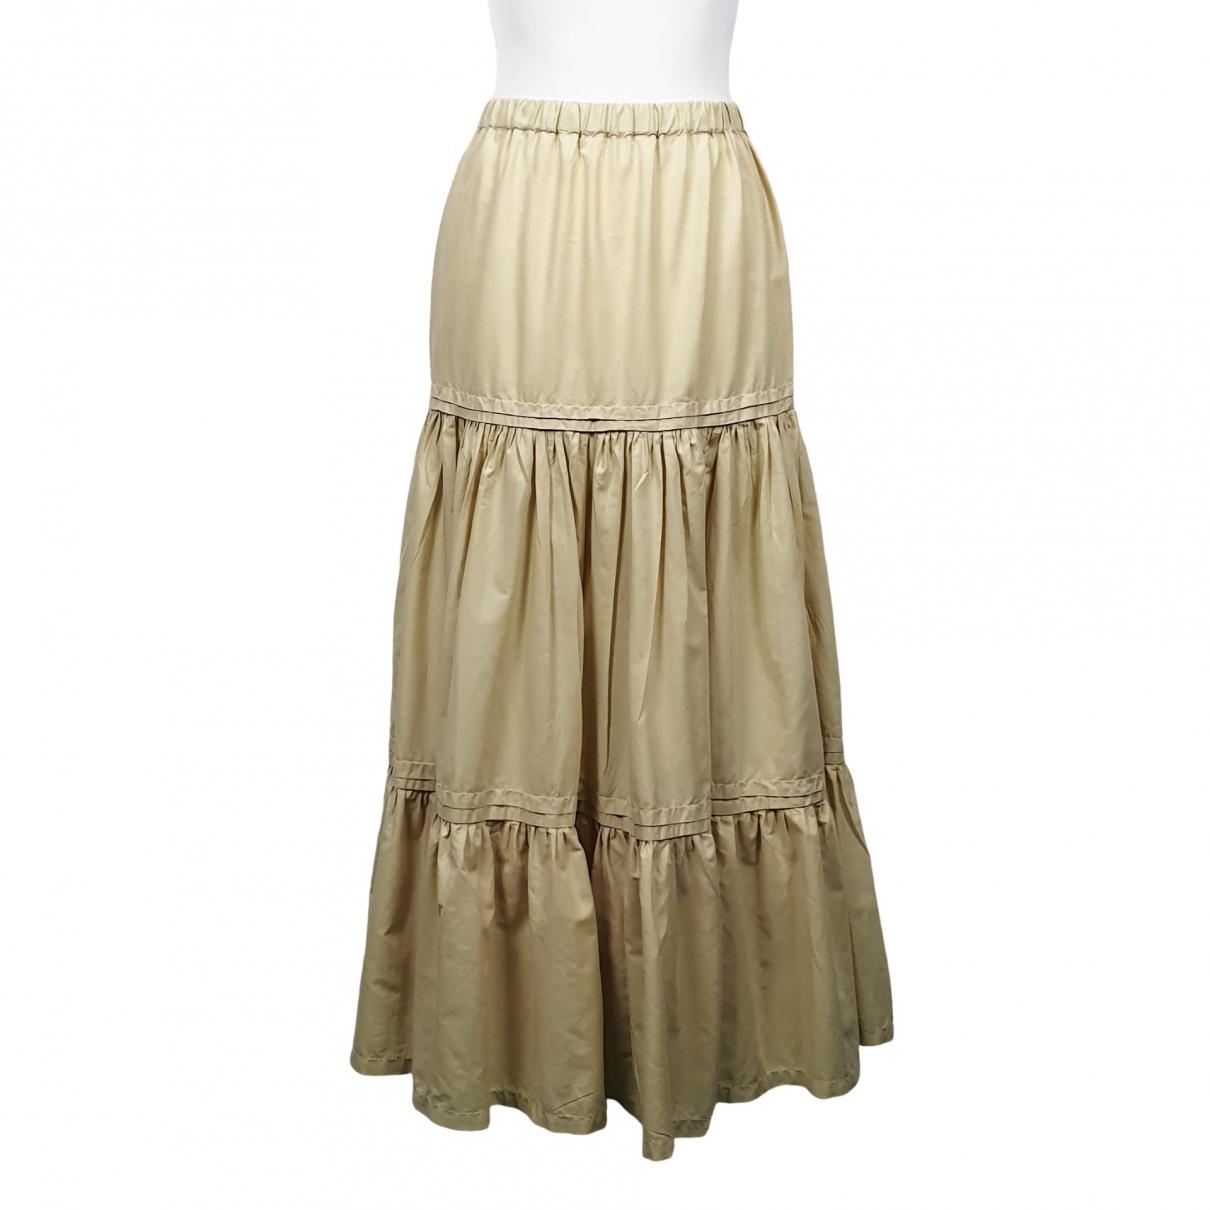 Romeo Gigli \N Beige Cotton skirt for Women One Size FR